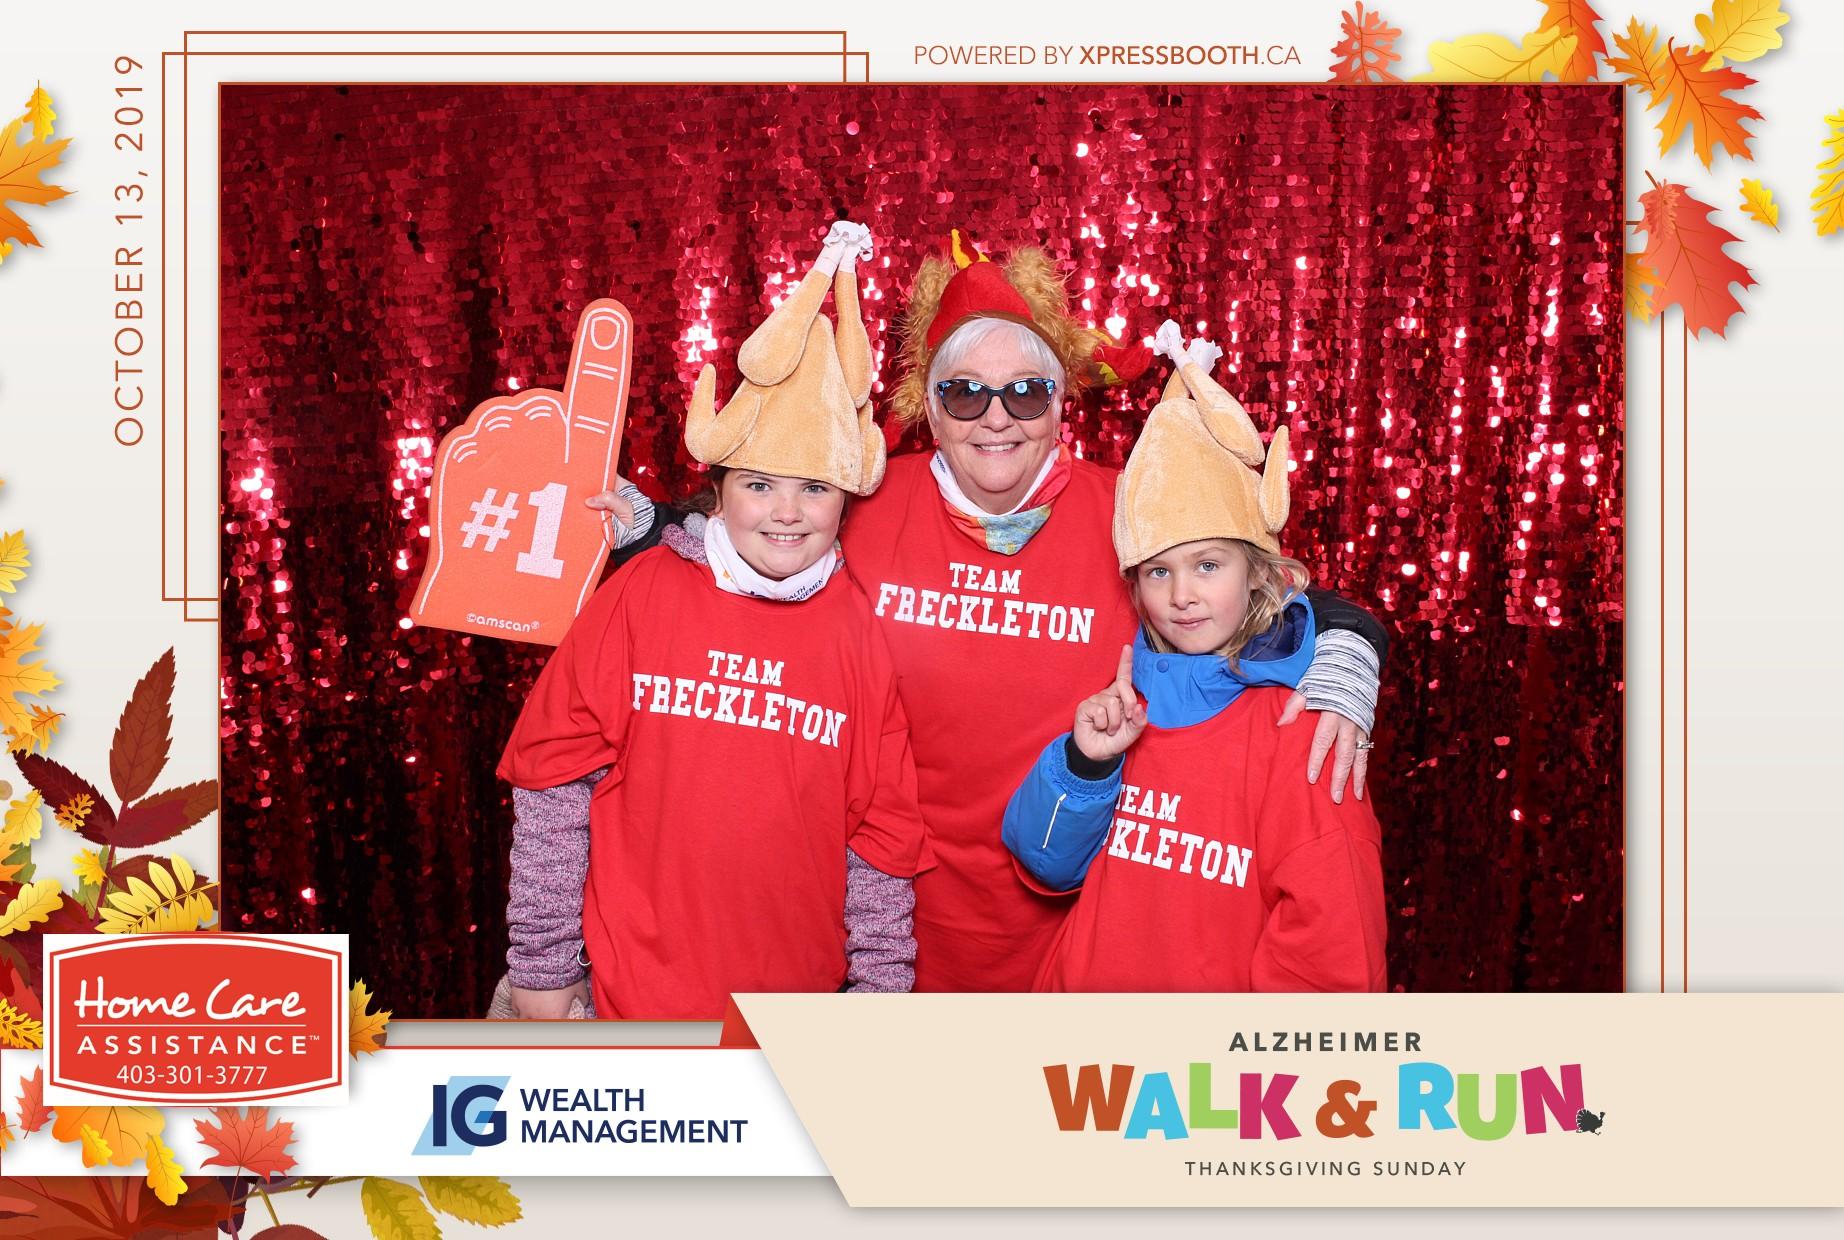 WalkRunAlzheimerSociety-0094-PRINT